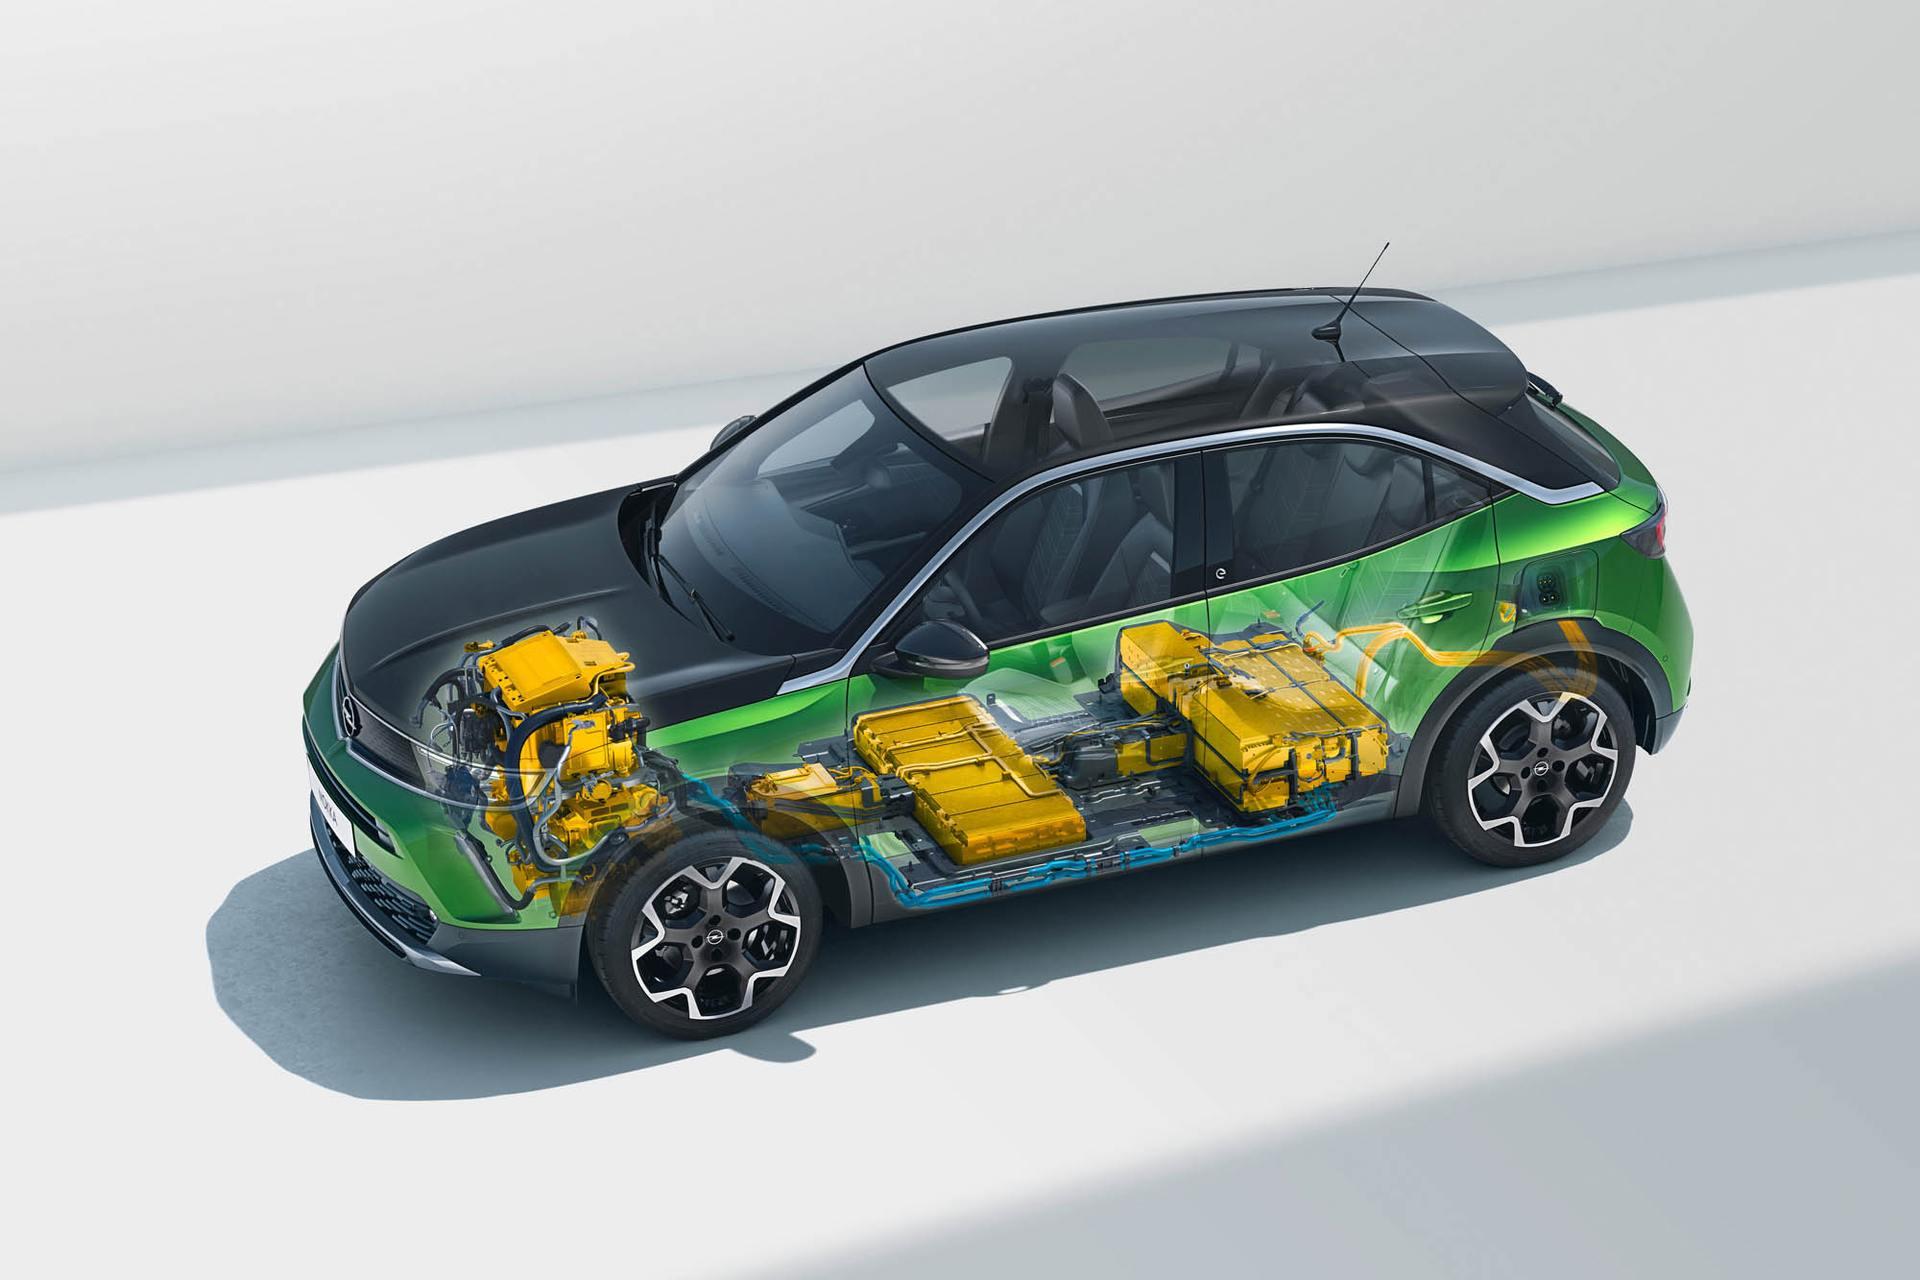 opel mokka 2021 09 - Apple CarPlay og surroundlyd